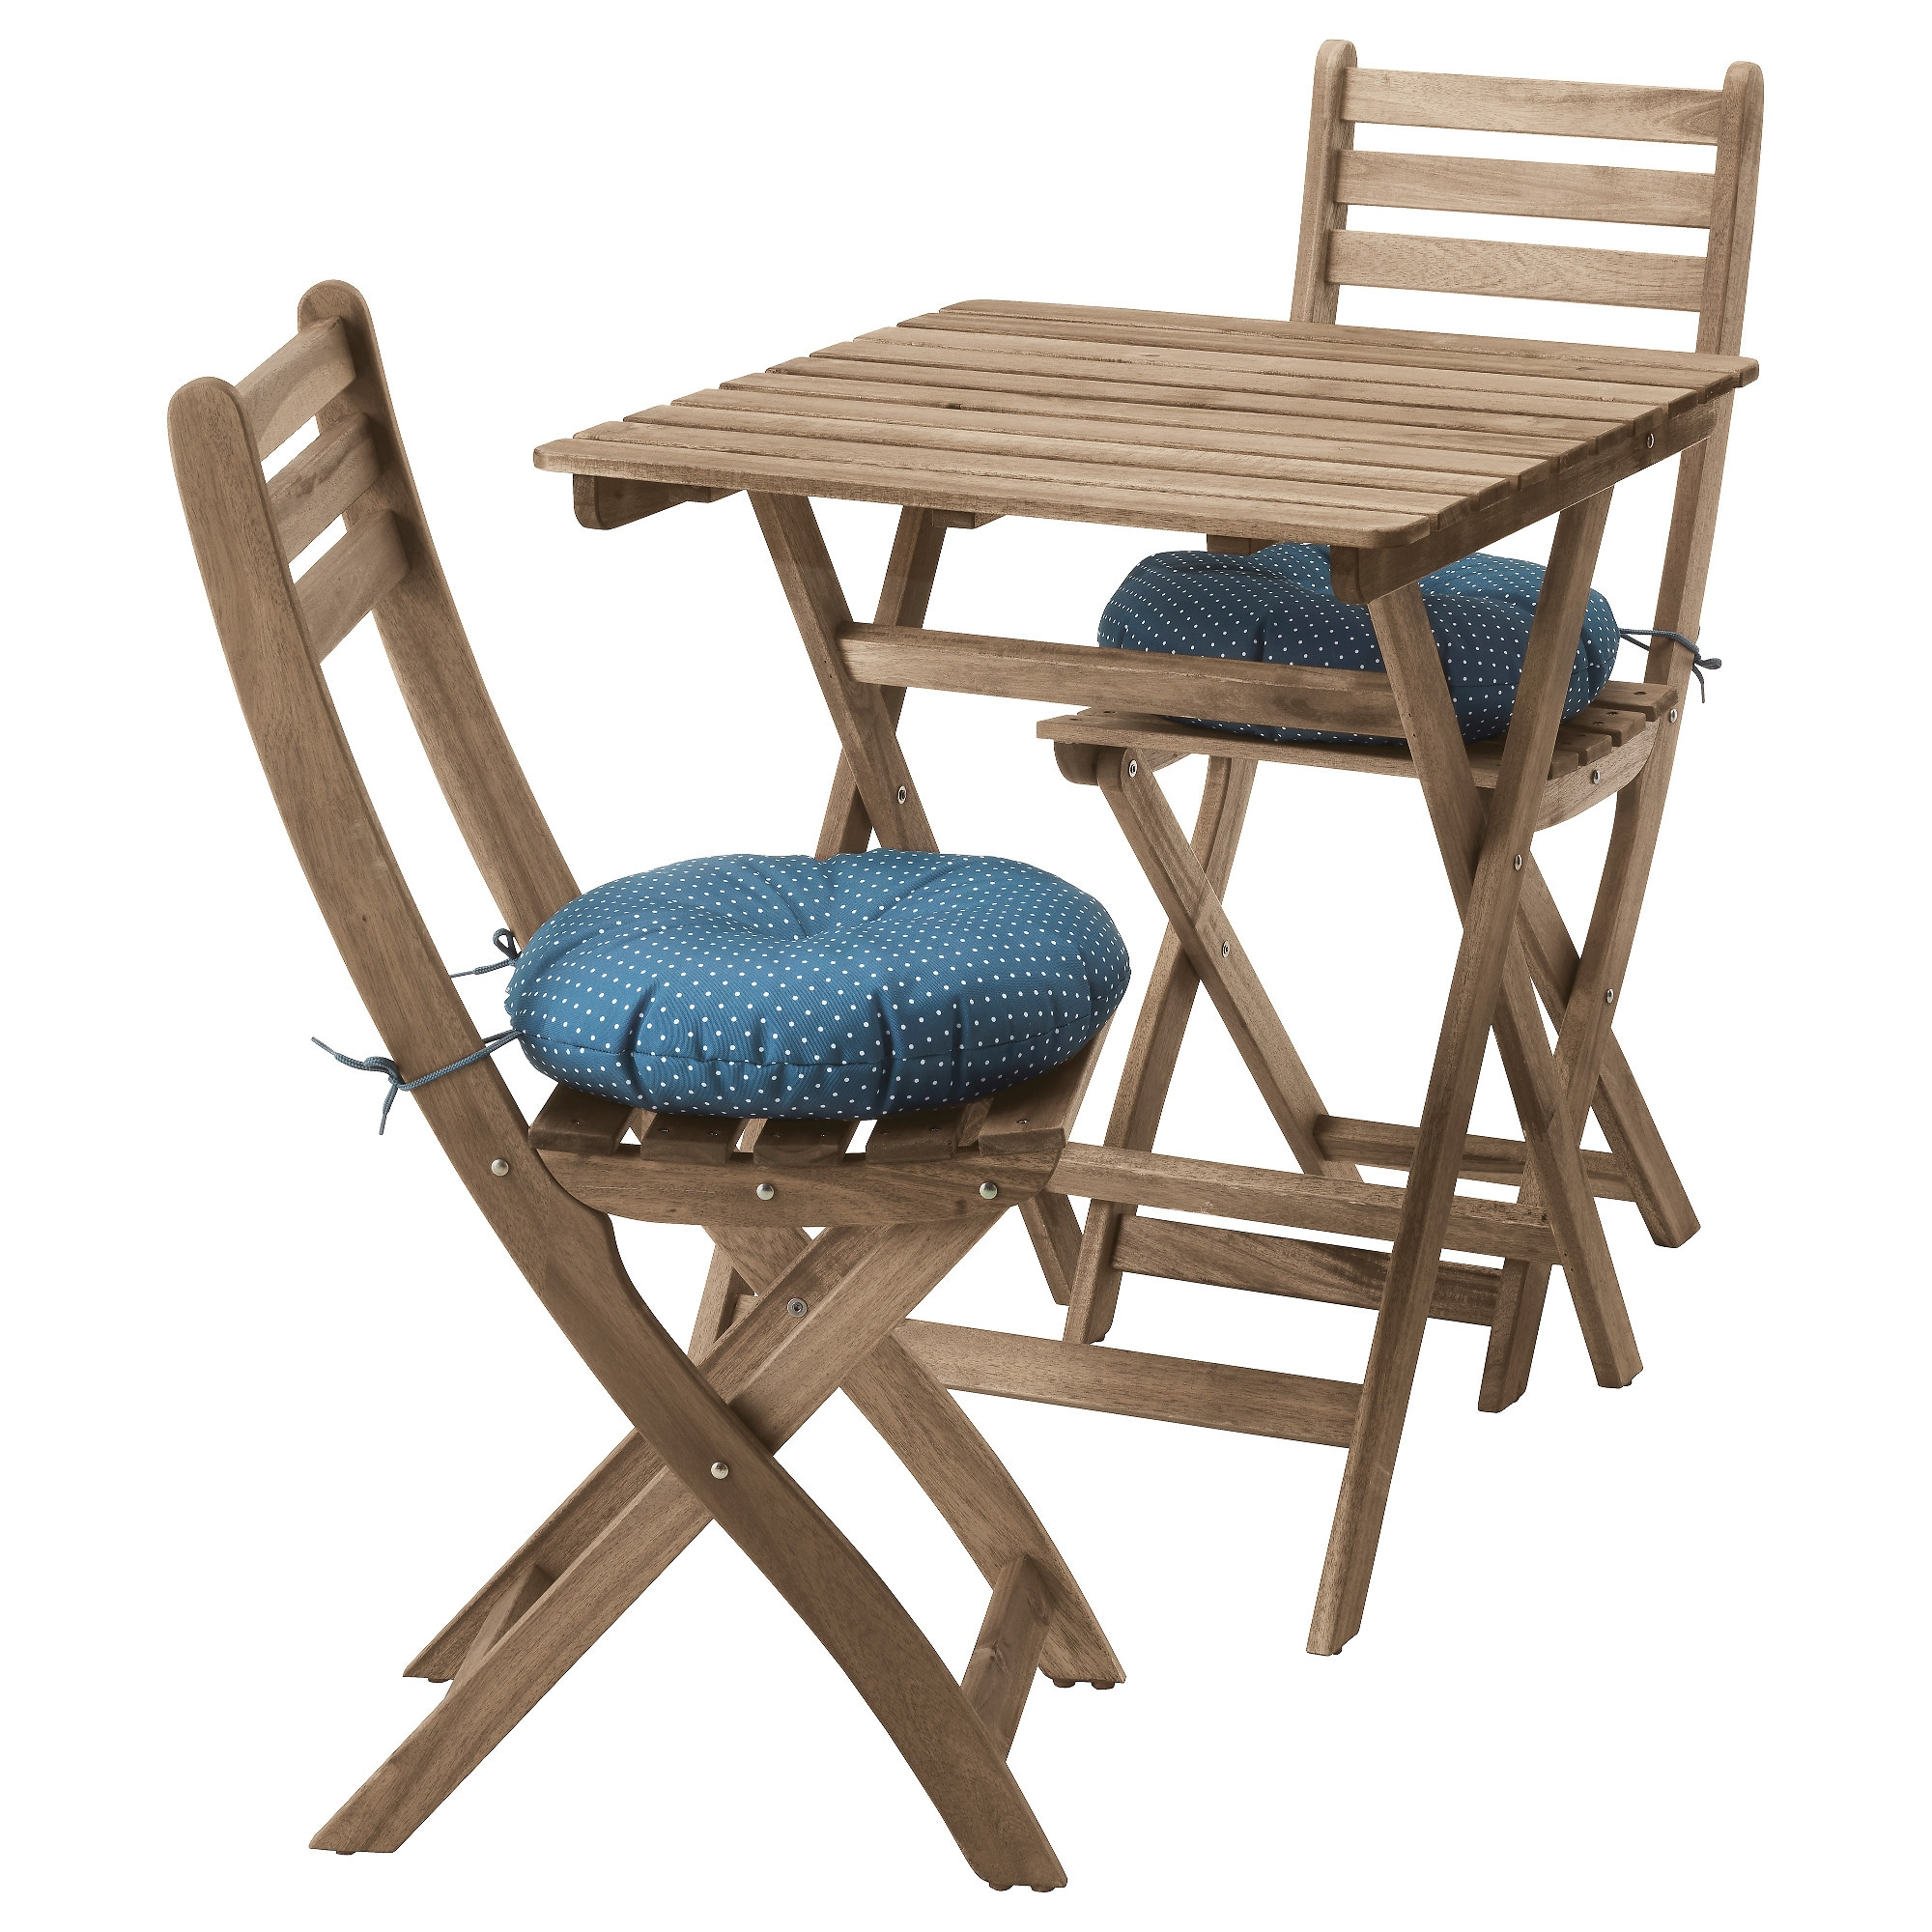 Стол + 2 стула, для сада АСКХОЛЬМЕН синий артикуль № 992.288.86 в наличии. Интернет каталог IKEA Беларусь. Недорогая доставка и монтаж.